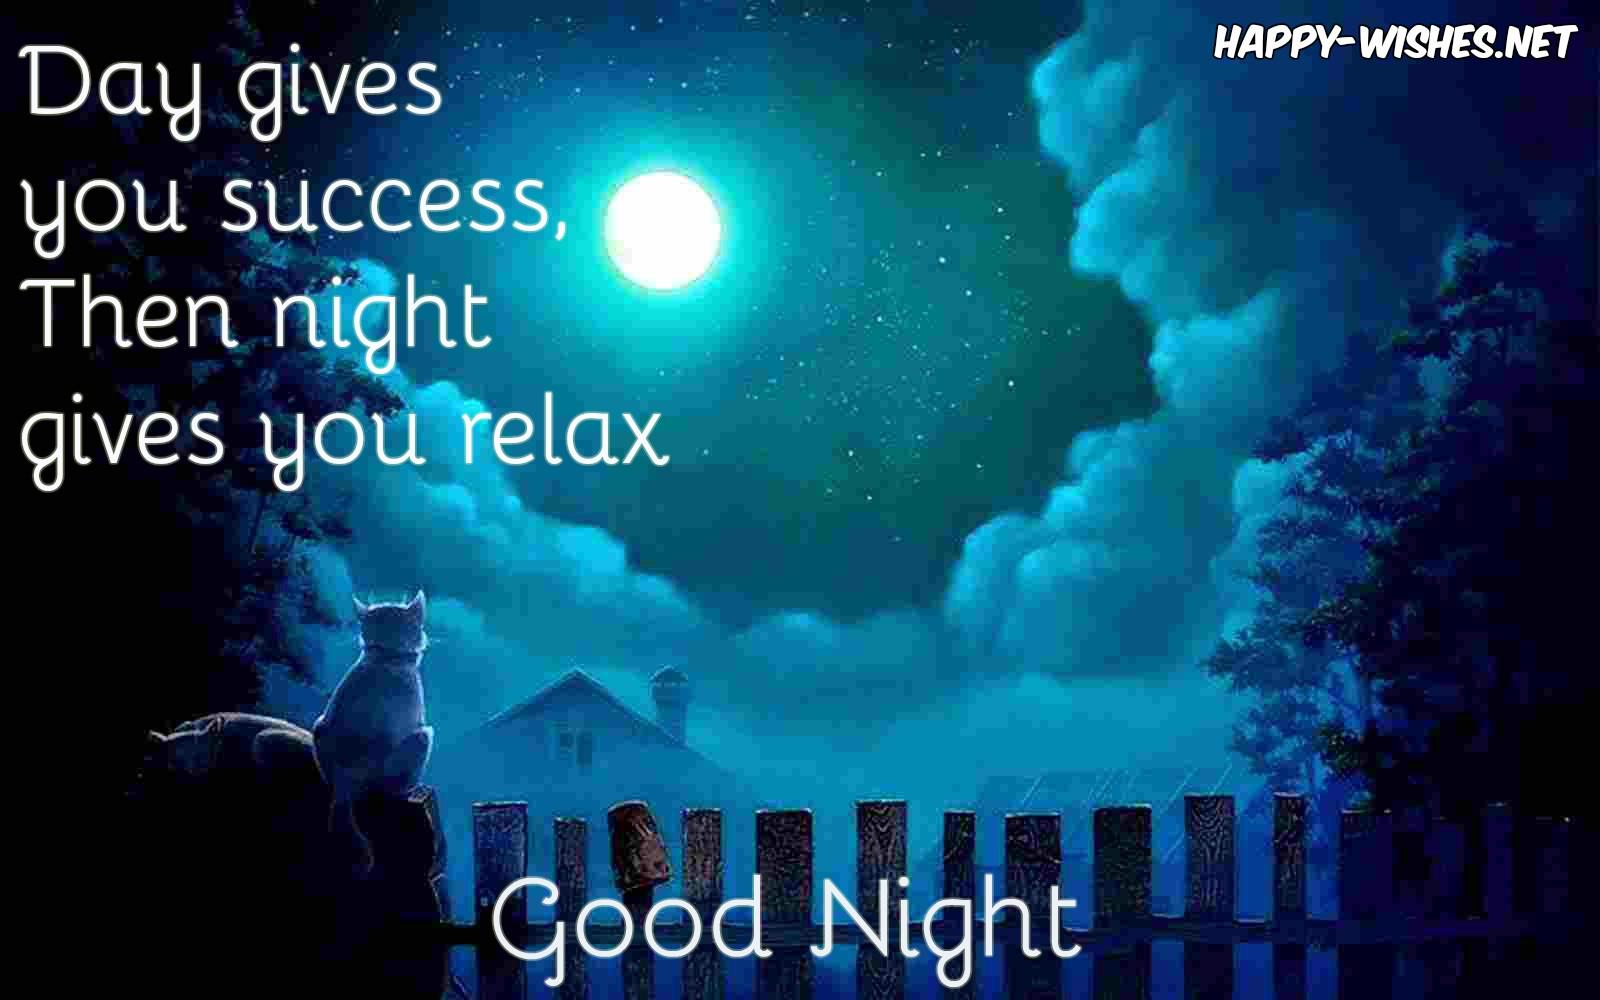 Good nightw ishes